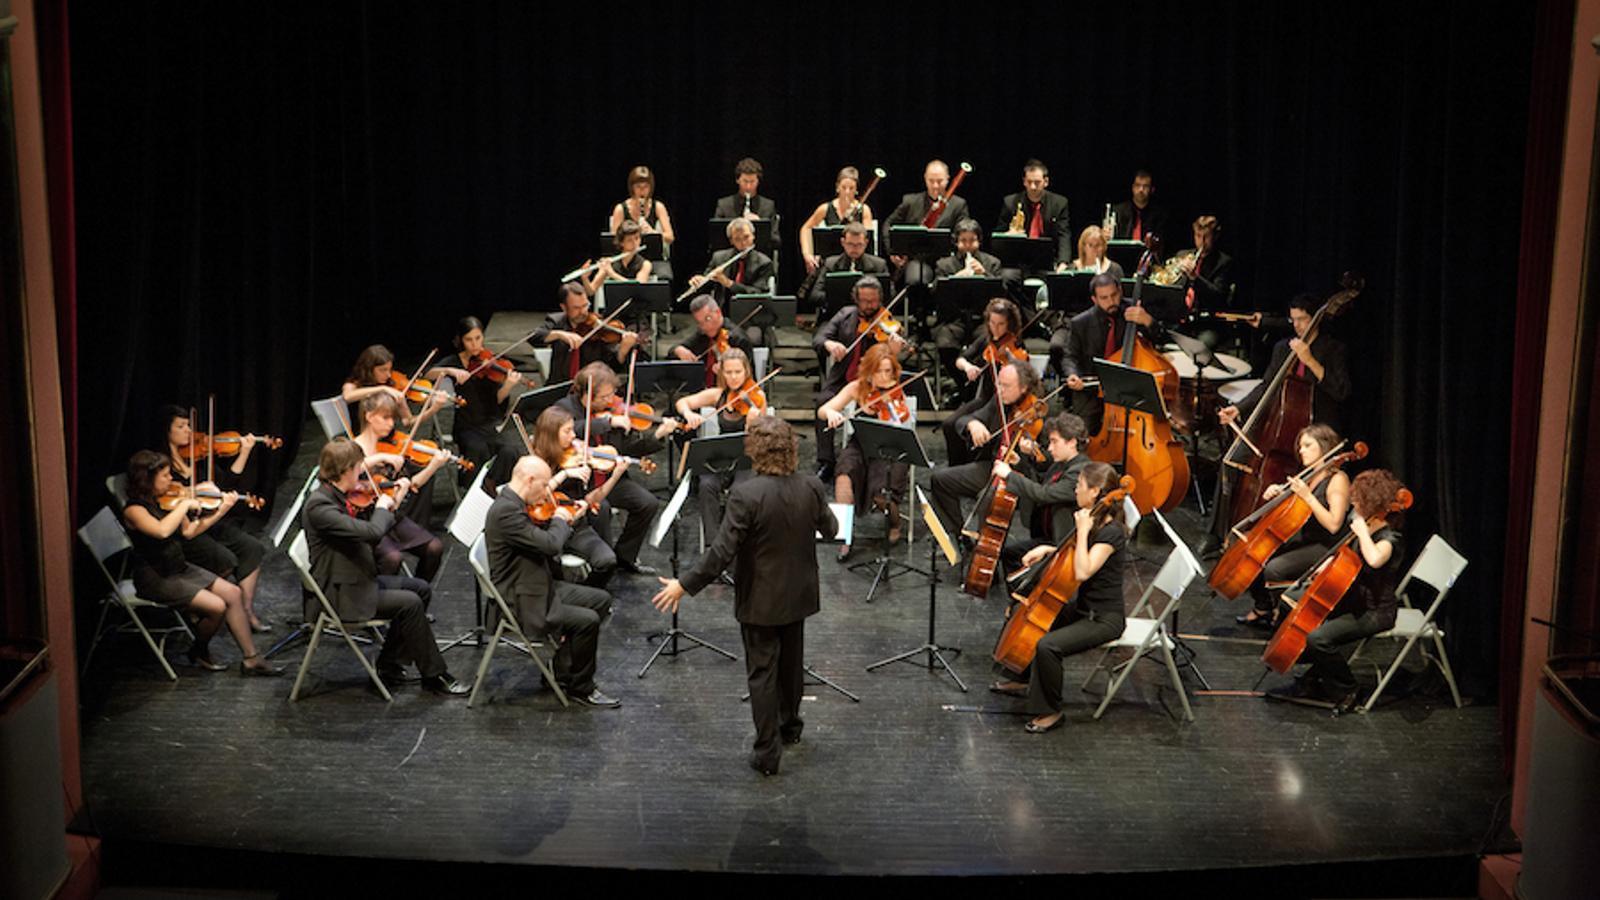 salvador inaugura la temporada l orquestra musicae